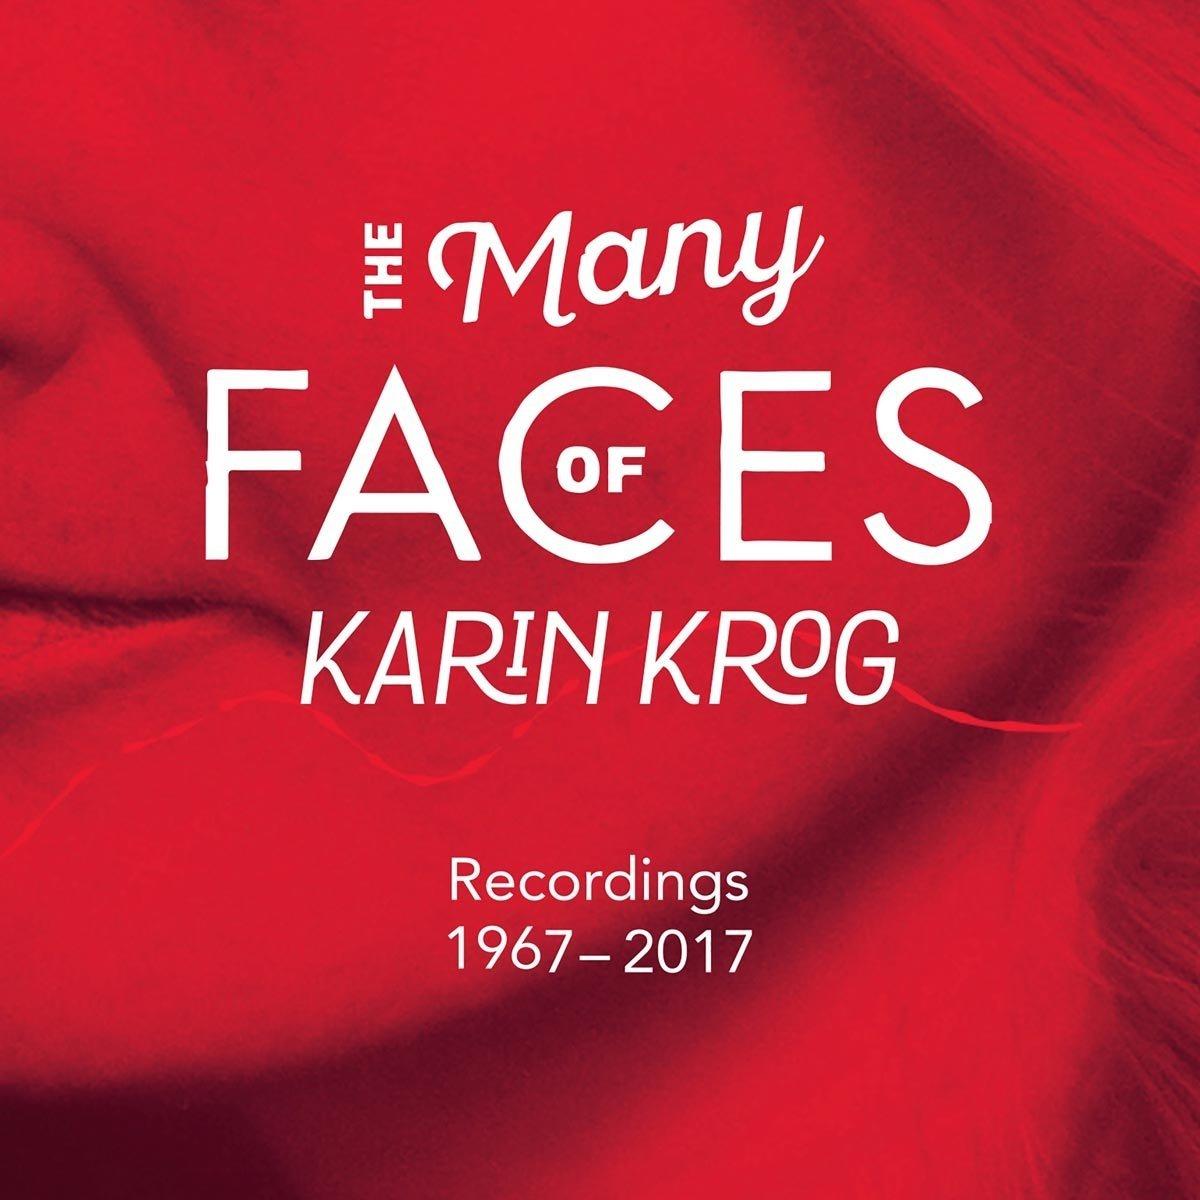 KARIN KROG - The Many Faces Of Karin Krog (1967-2017) cover